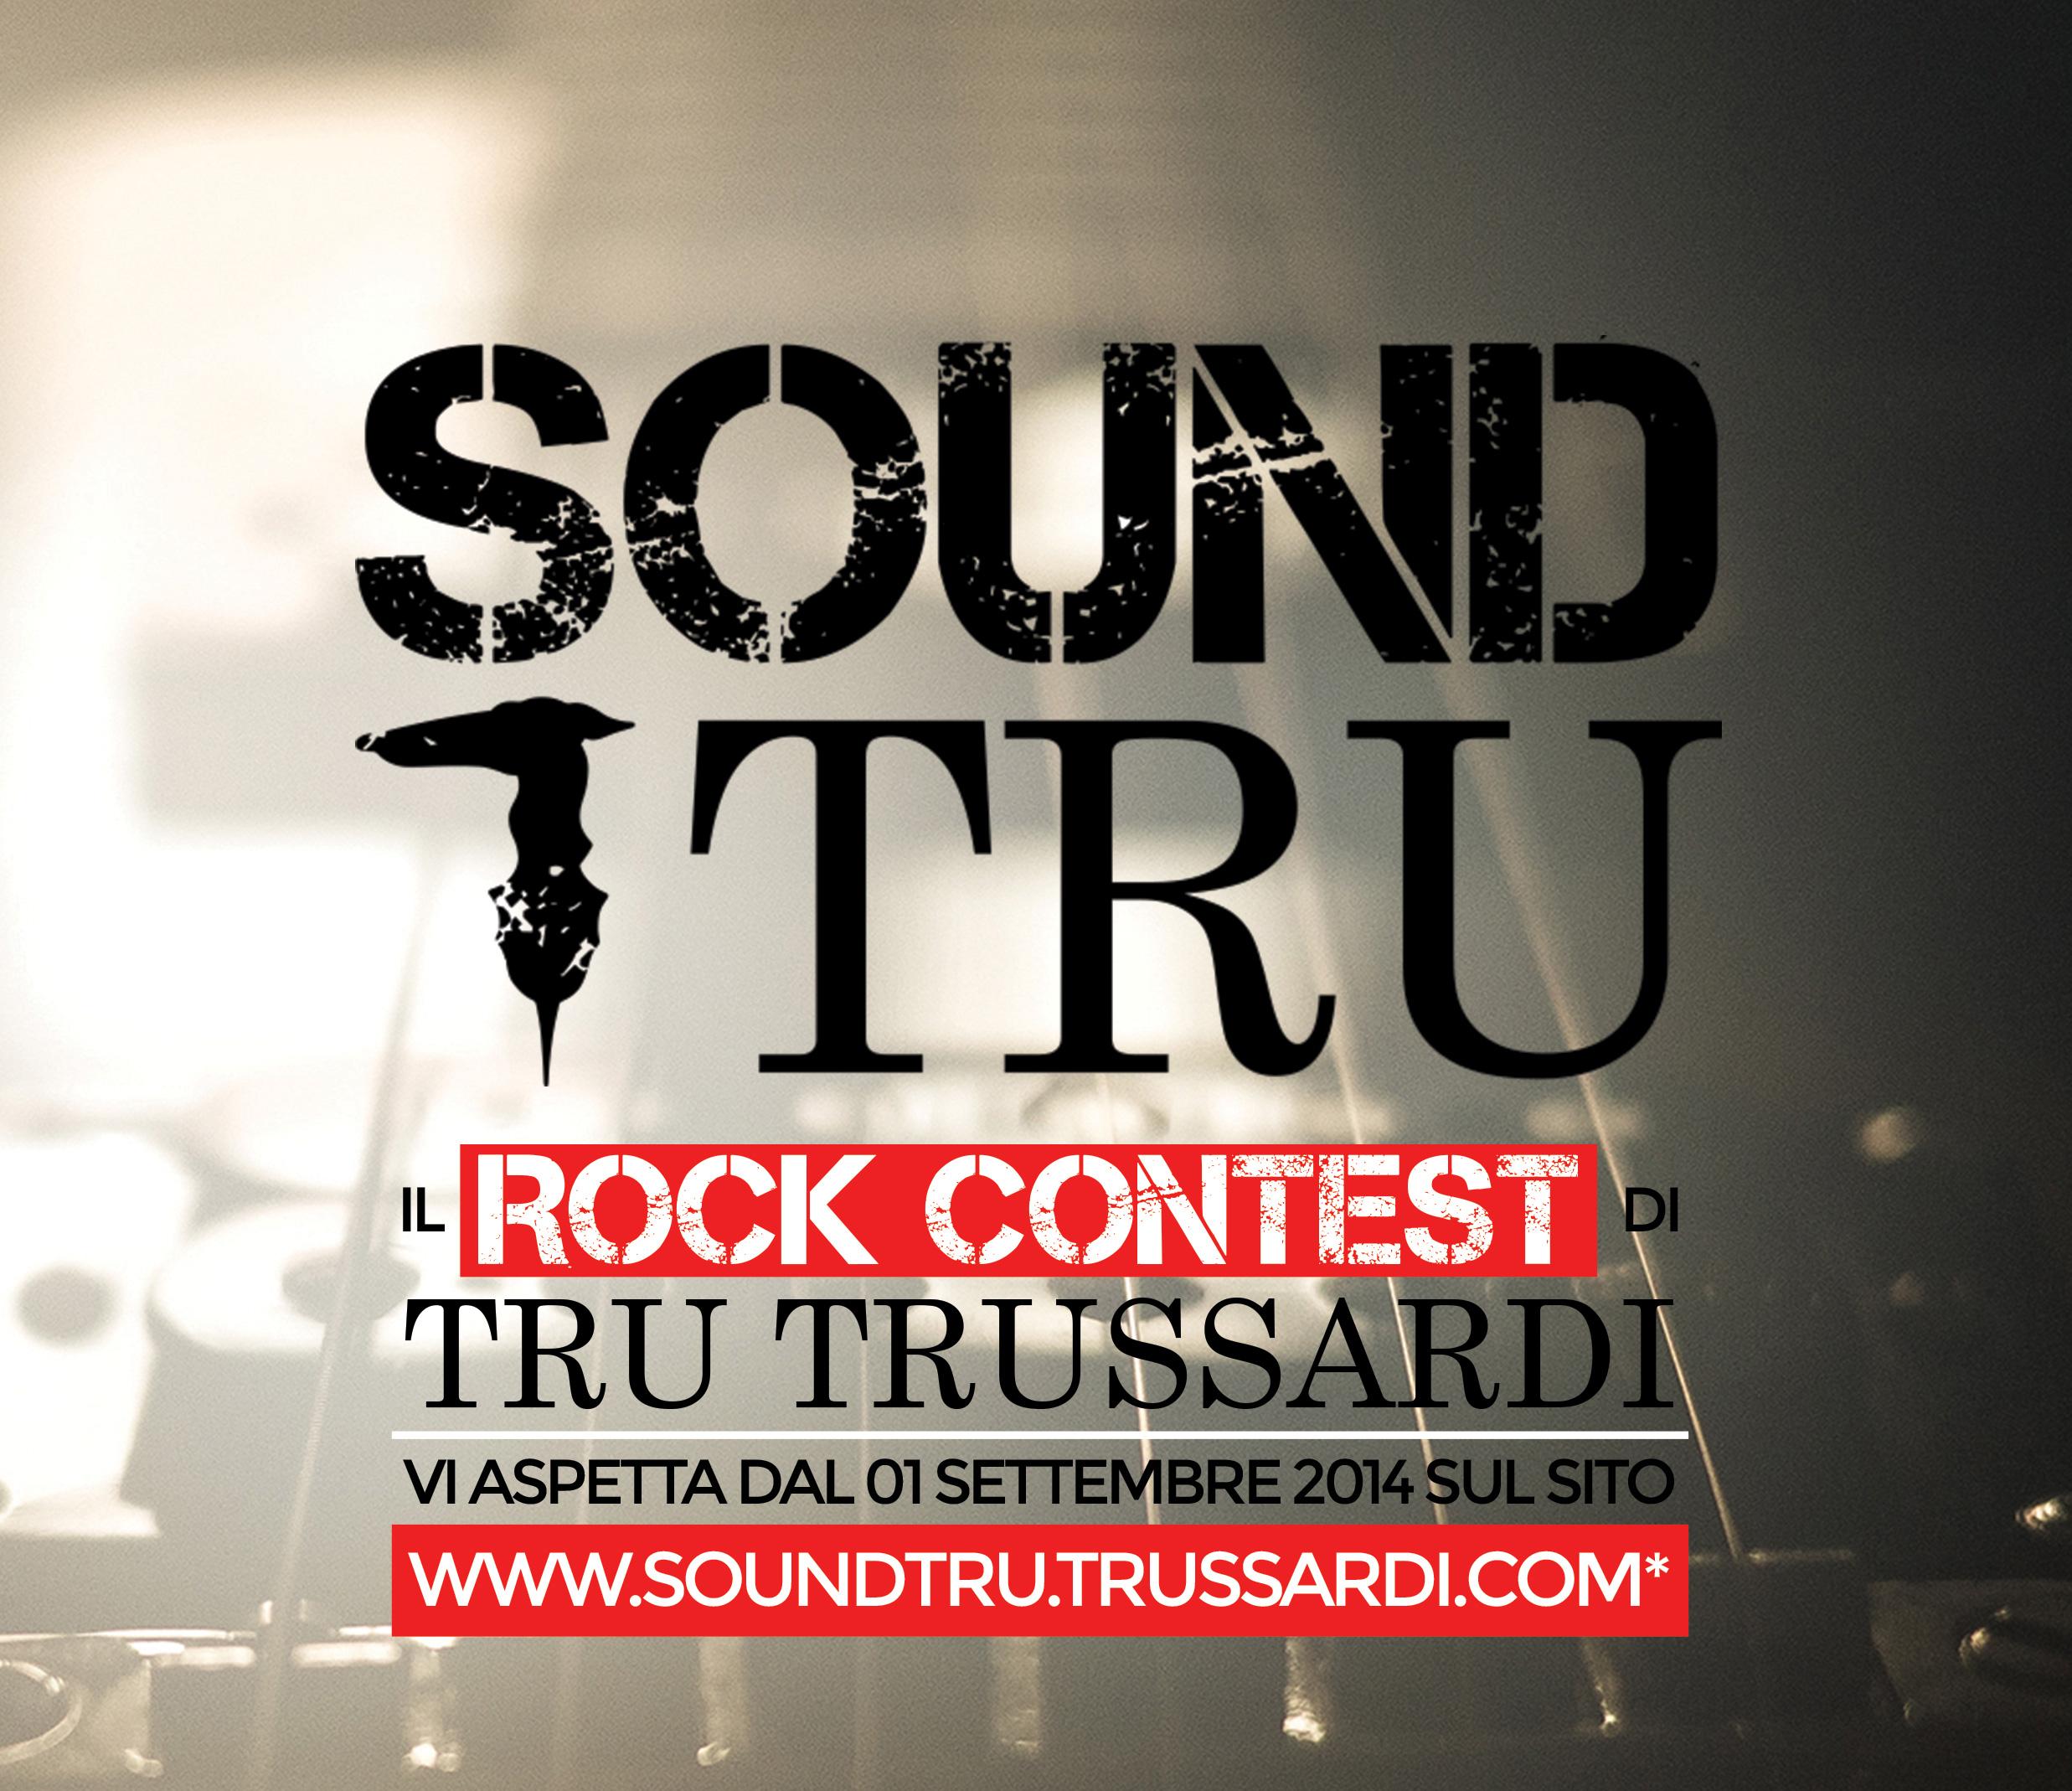 https://www.promotionmagazine.it/wp/wp-content/uploads/2014/10/Trussardi-sito.png